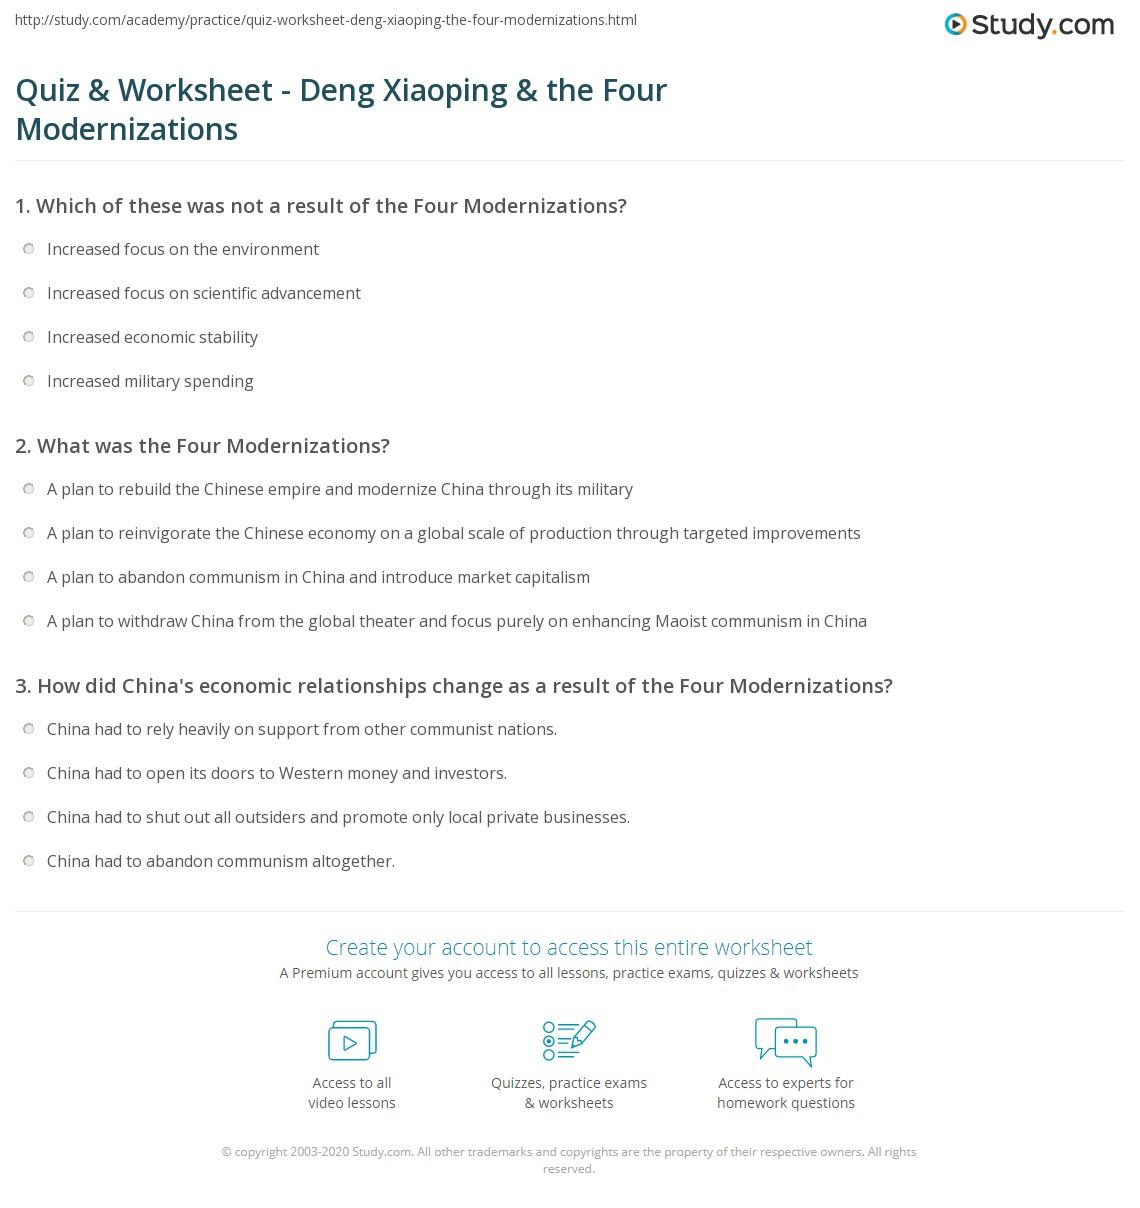 Quiz Worksheet Deng Xiaoping The Four Modernizations Study Com